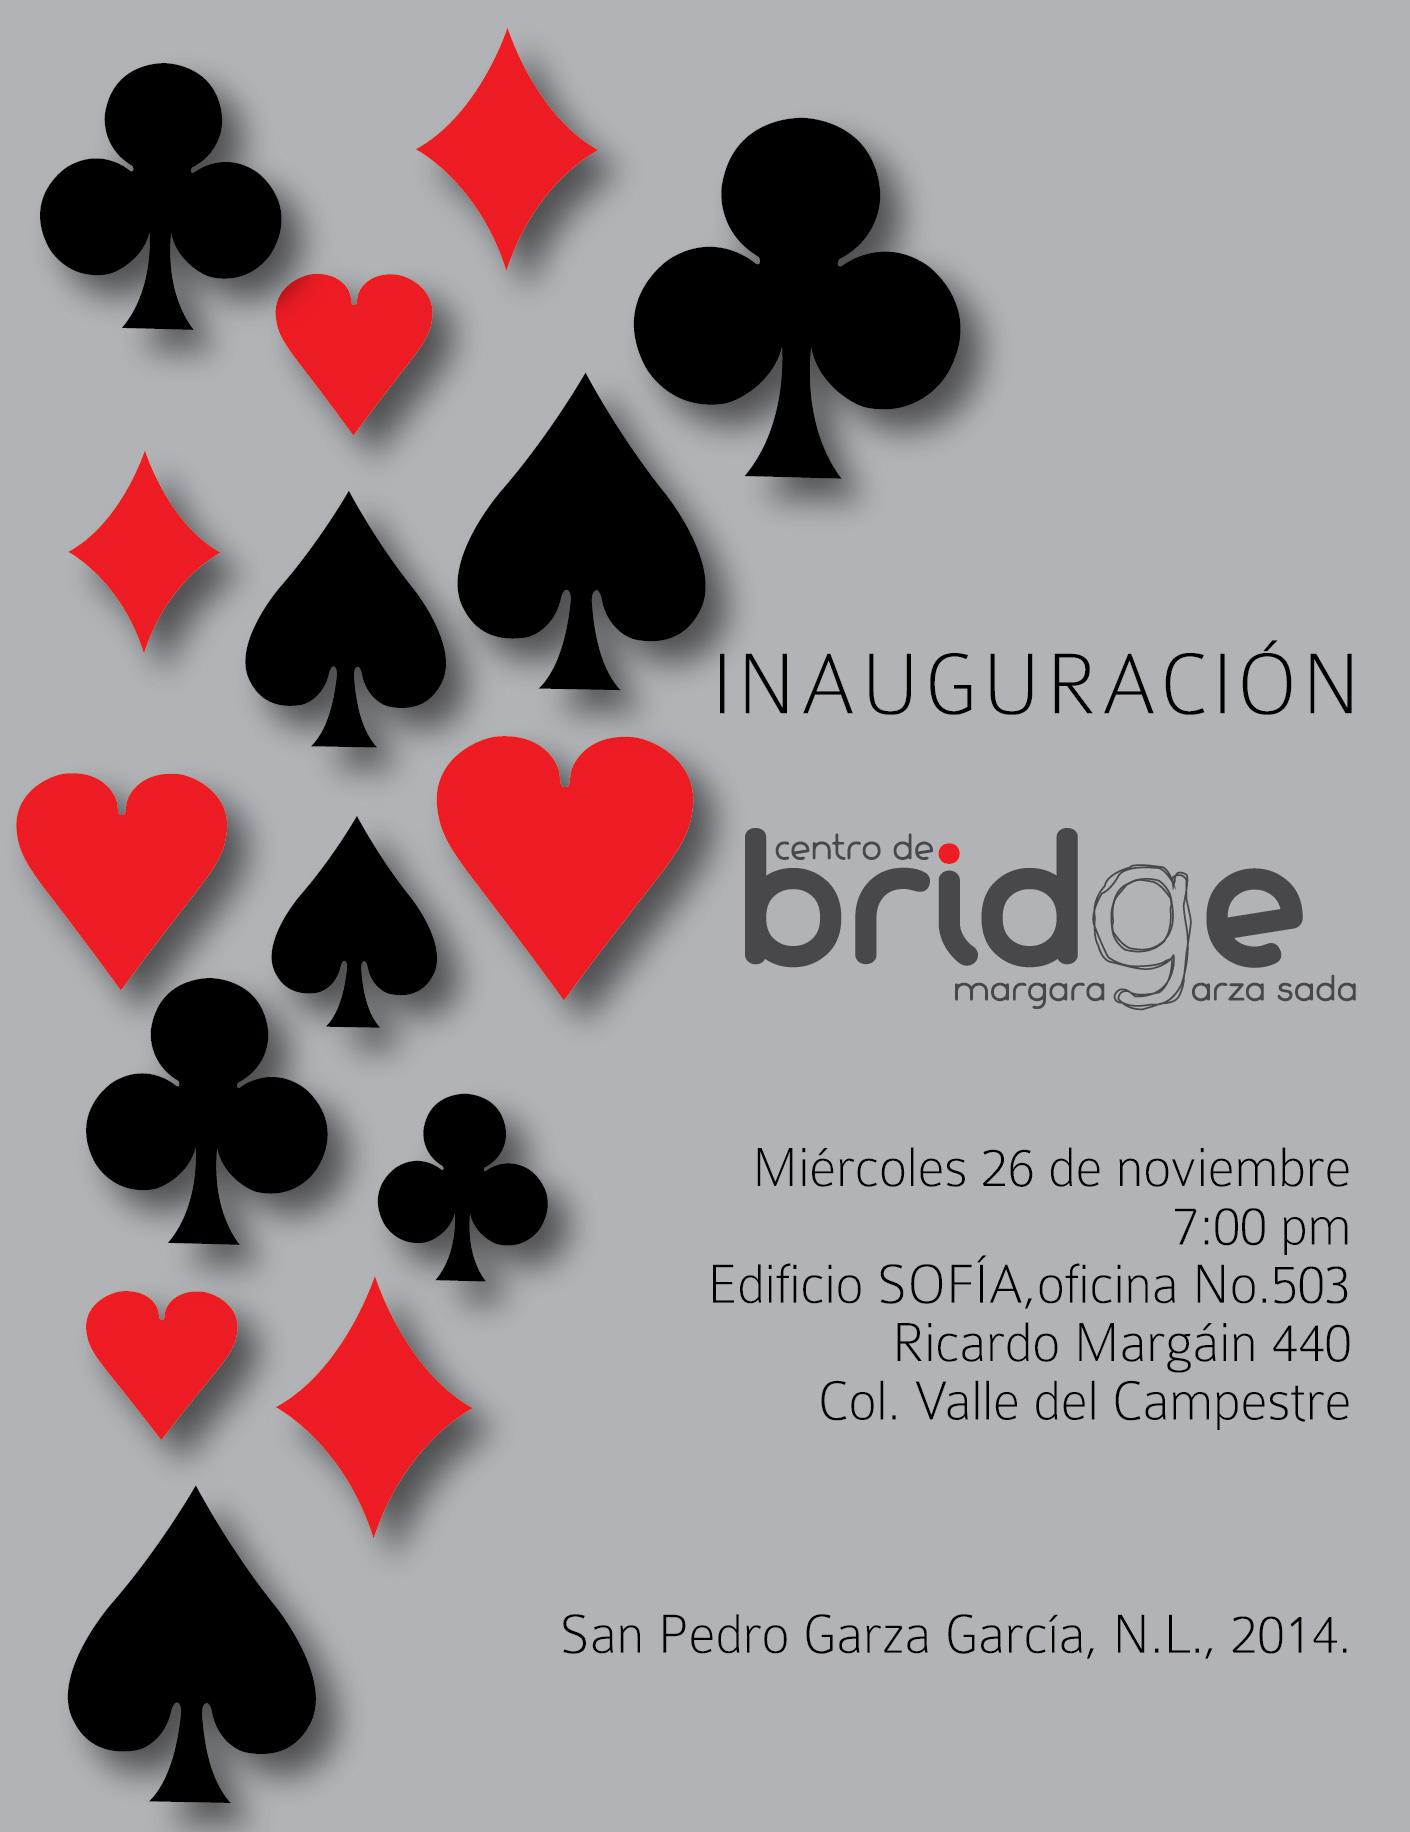 invitacion centro de bridge-01.jpg